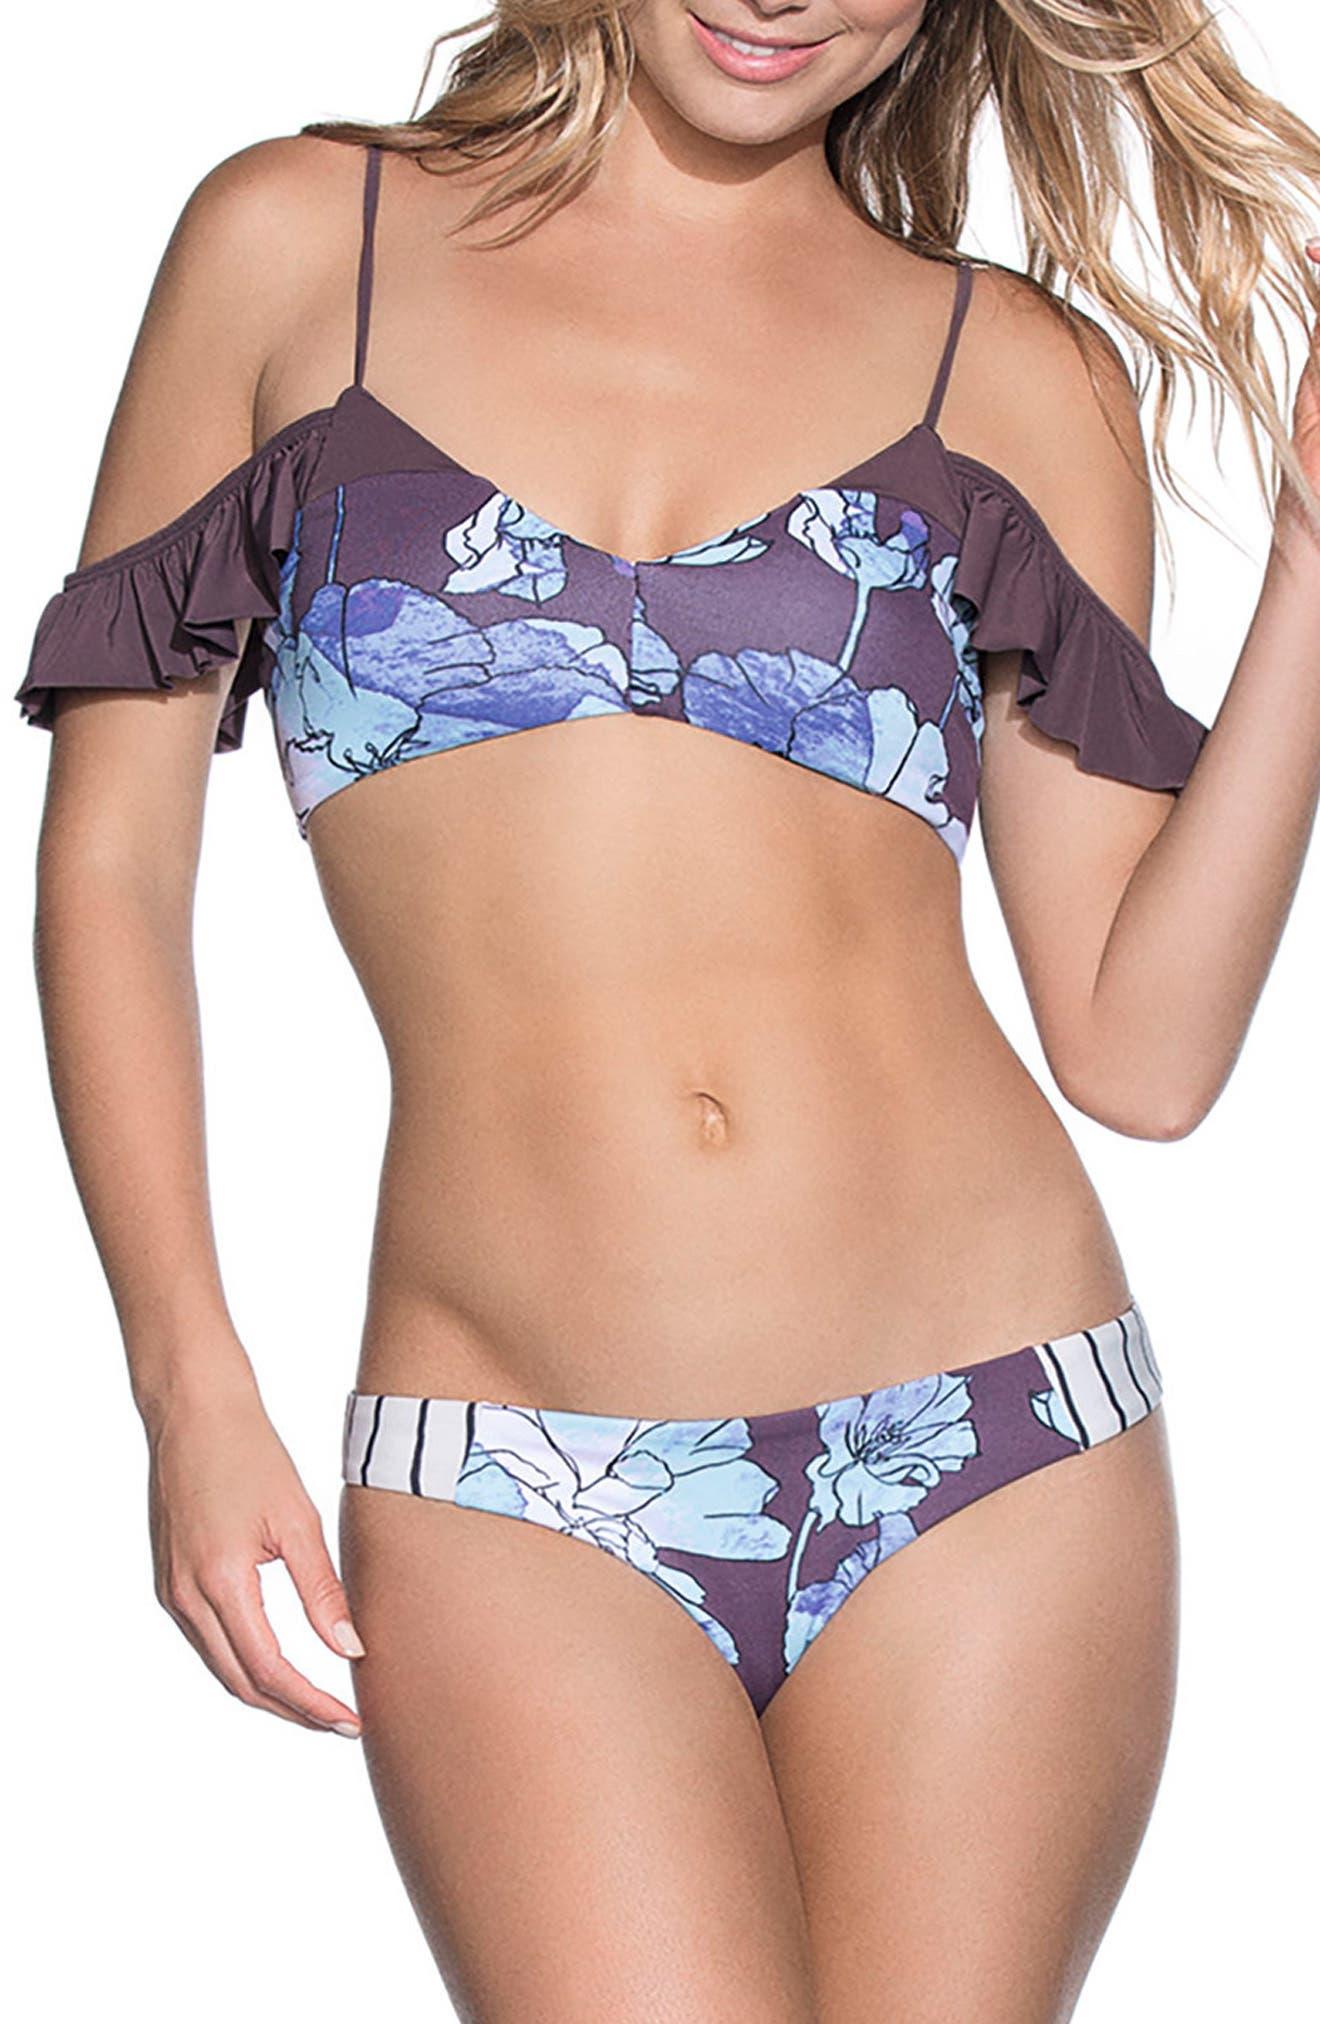 Sierra Nevada Off the Shoulder Reversible Bikini Top,                             Alternate thumbnail 3, color,                             Purple Multi